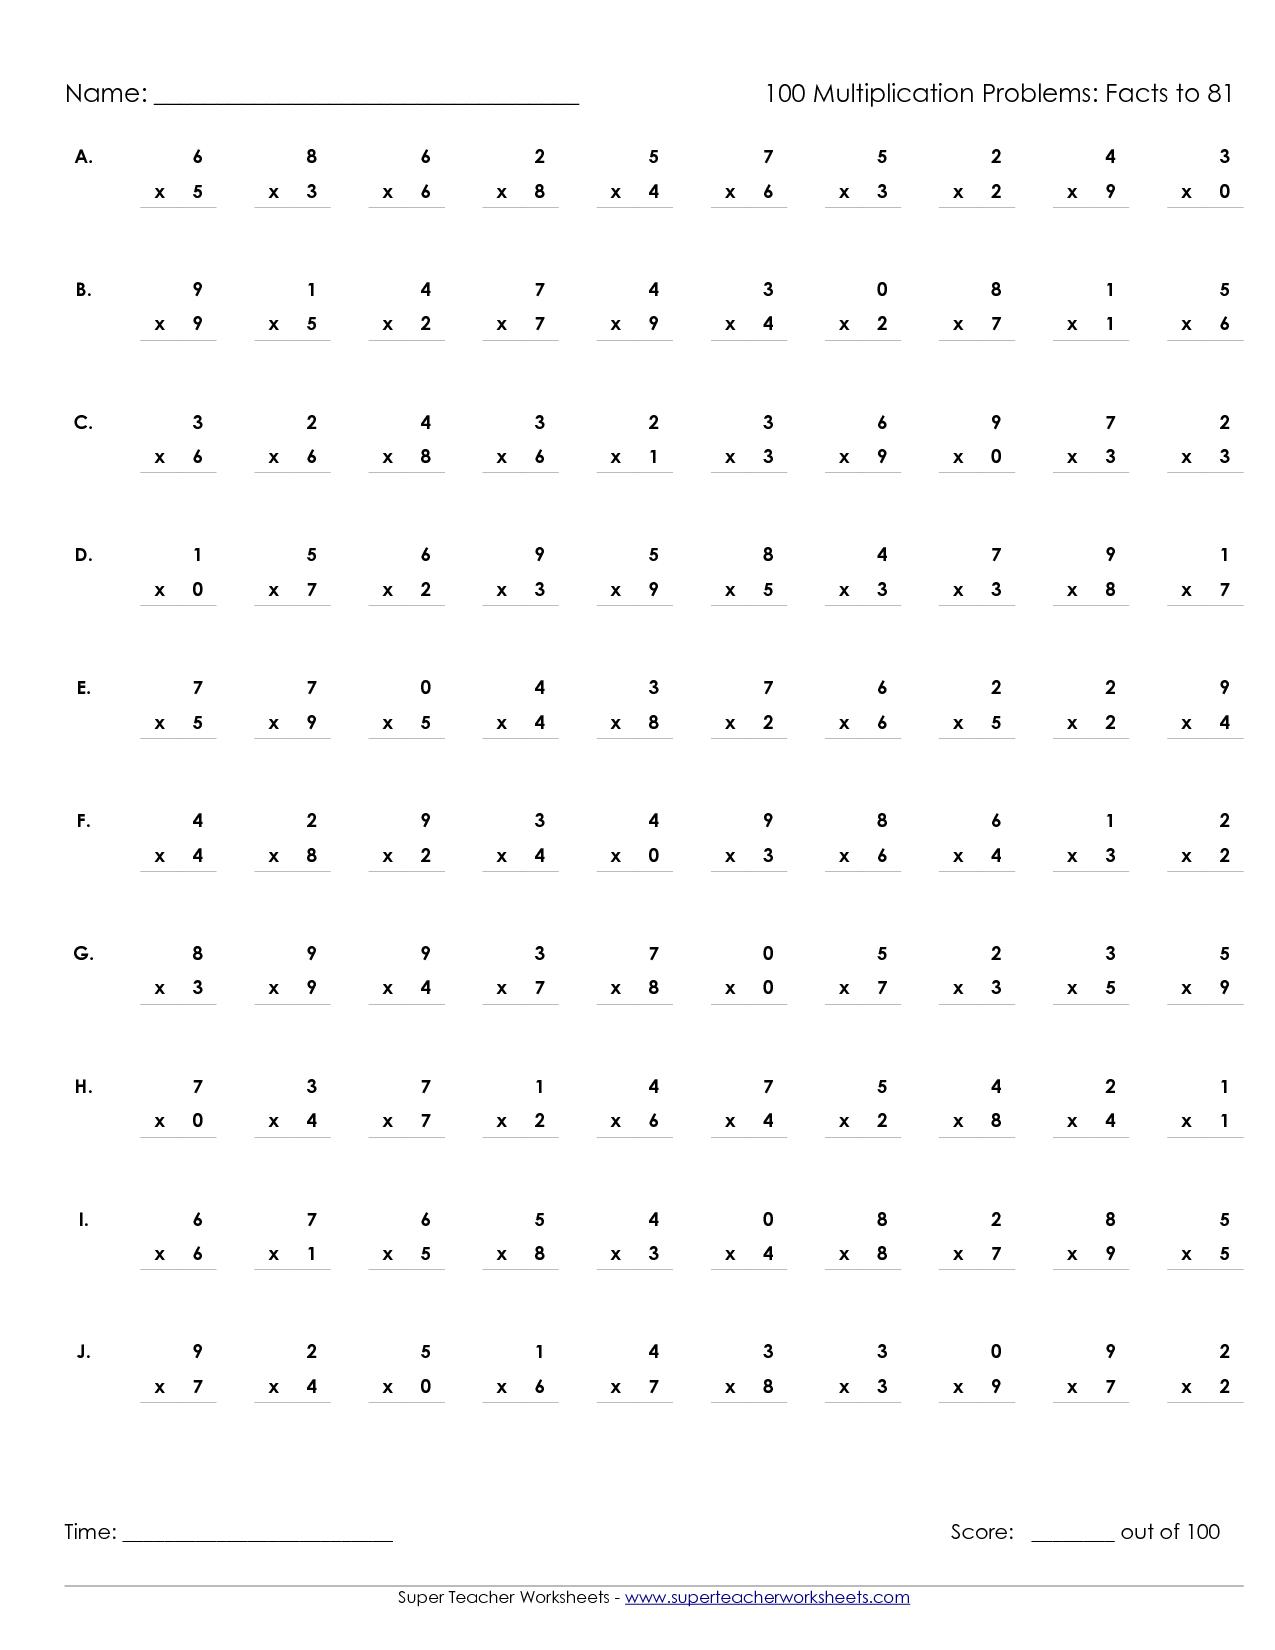 Printable Multiplication Worksheets 100 Problems intended for Printable Multiplication Practice Test